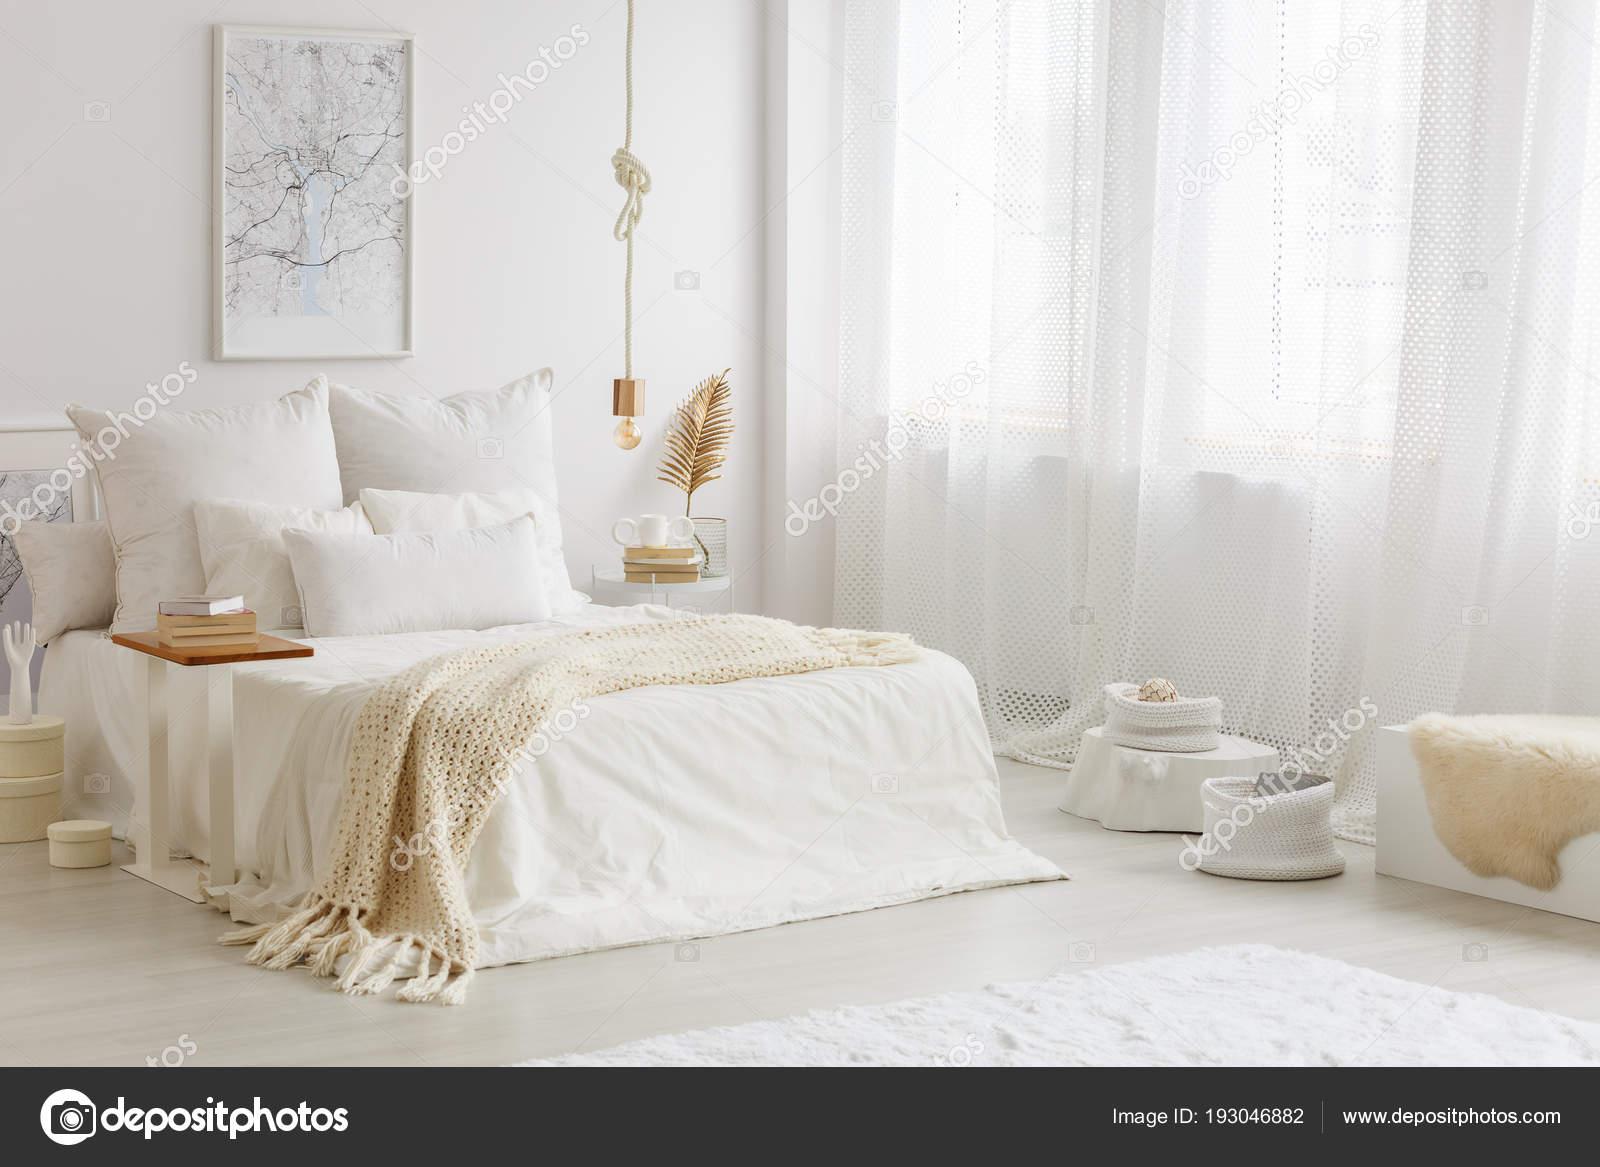 warm white gold bedroom interior beige blanket white sheets bed stock photo c photographee eu 193046882